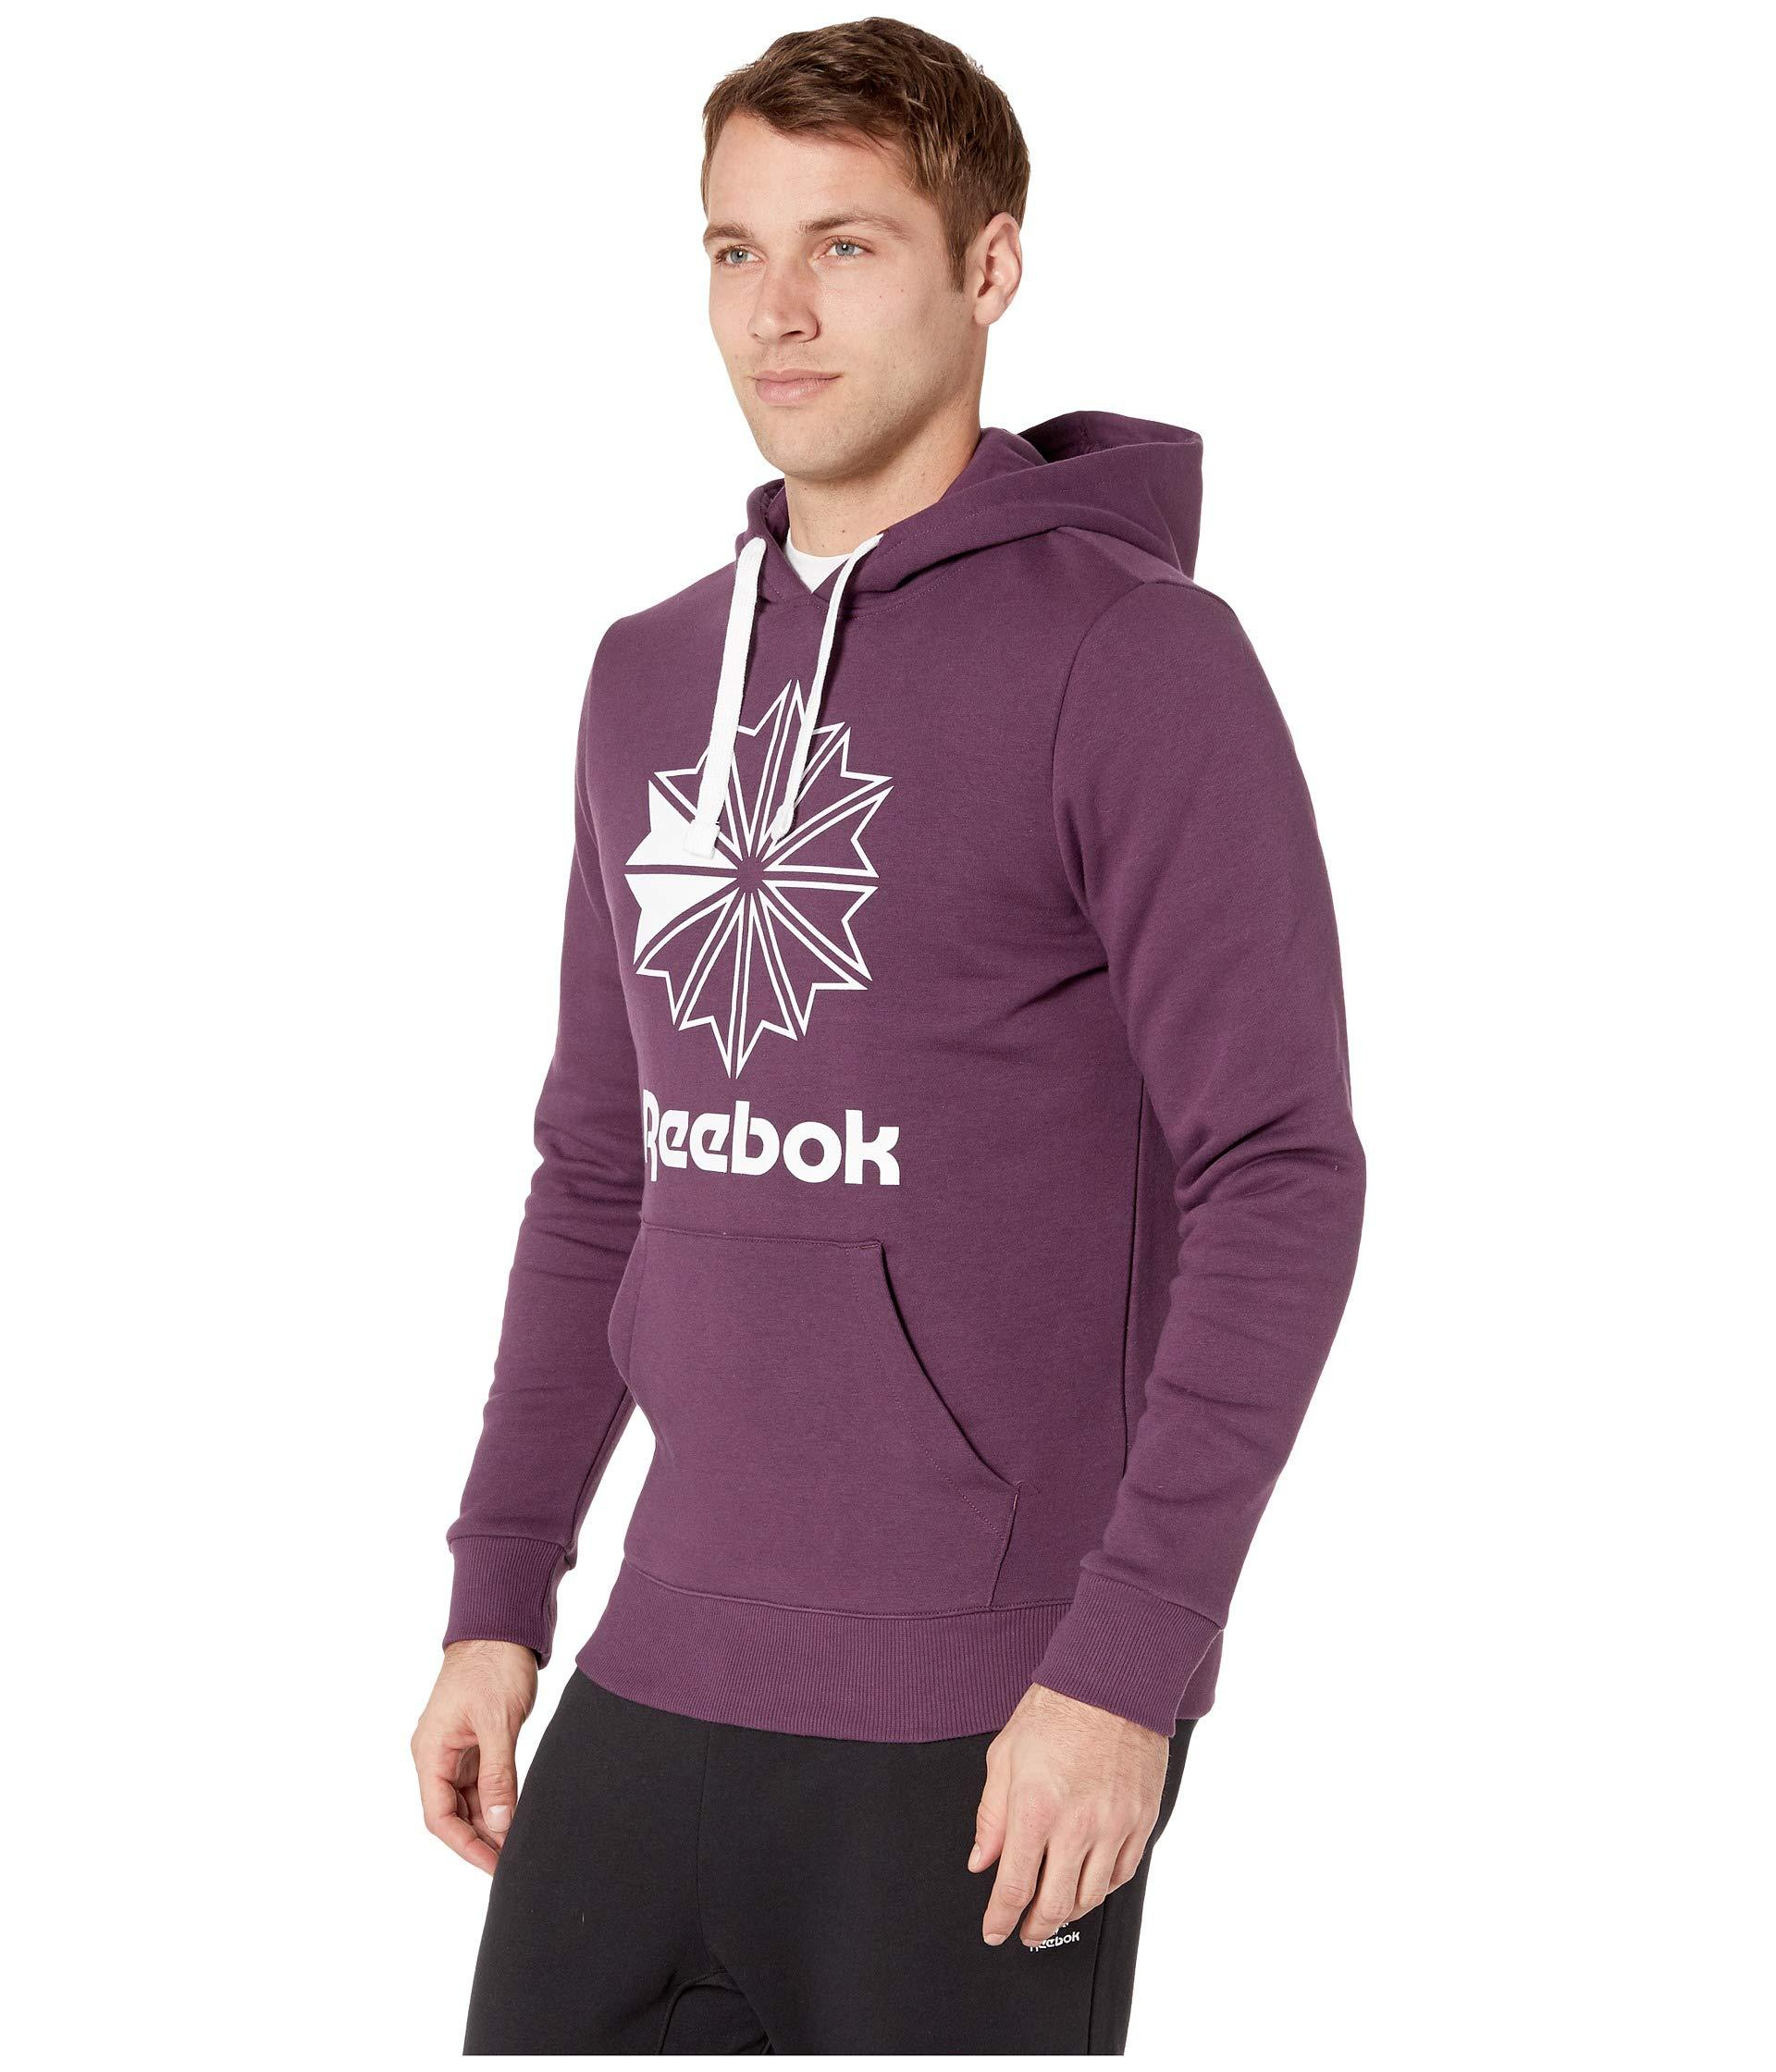 e916333c78e0 Lyst - Reebok Classics Big Logo Hoodie in Purple for Men